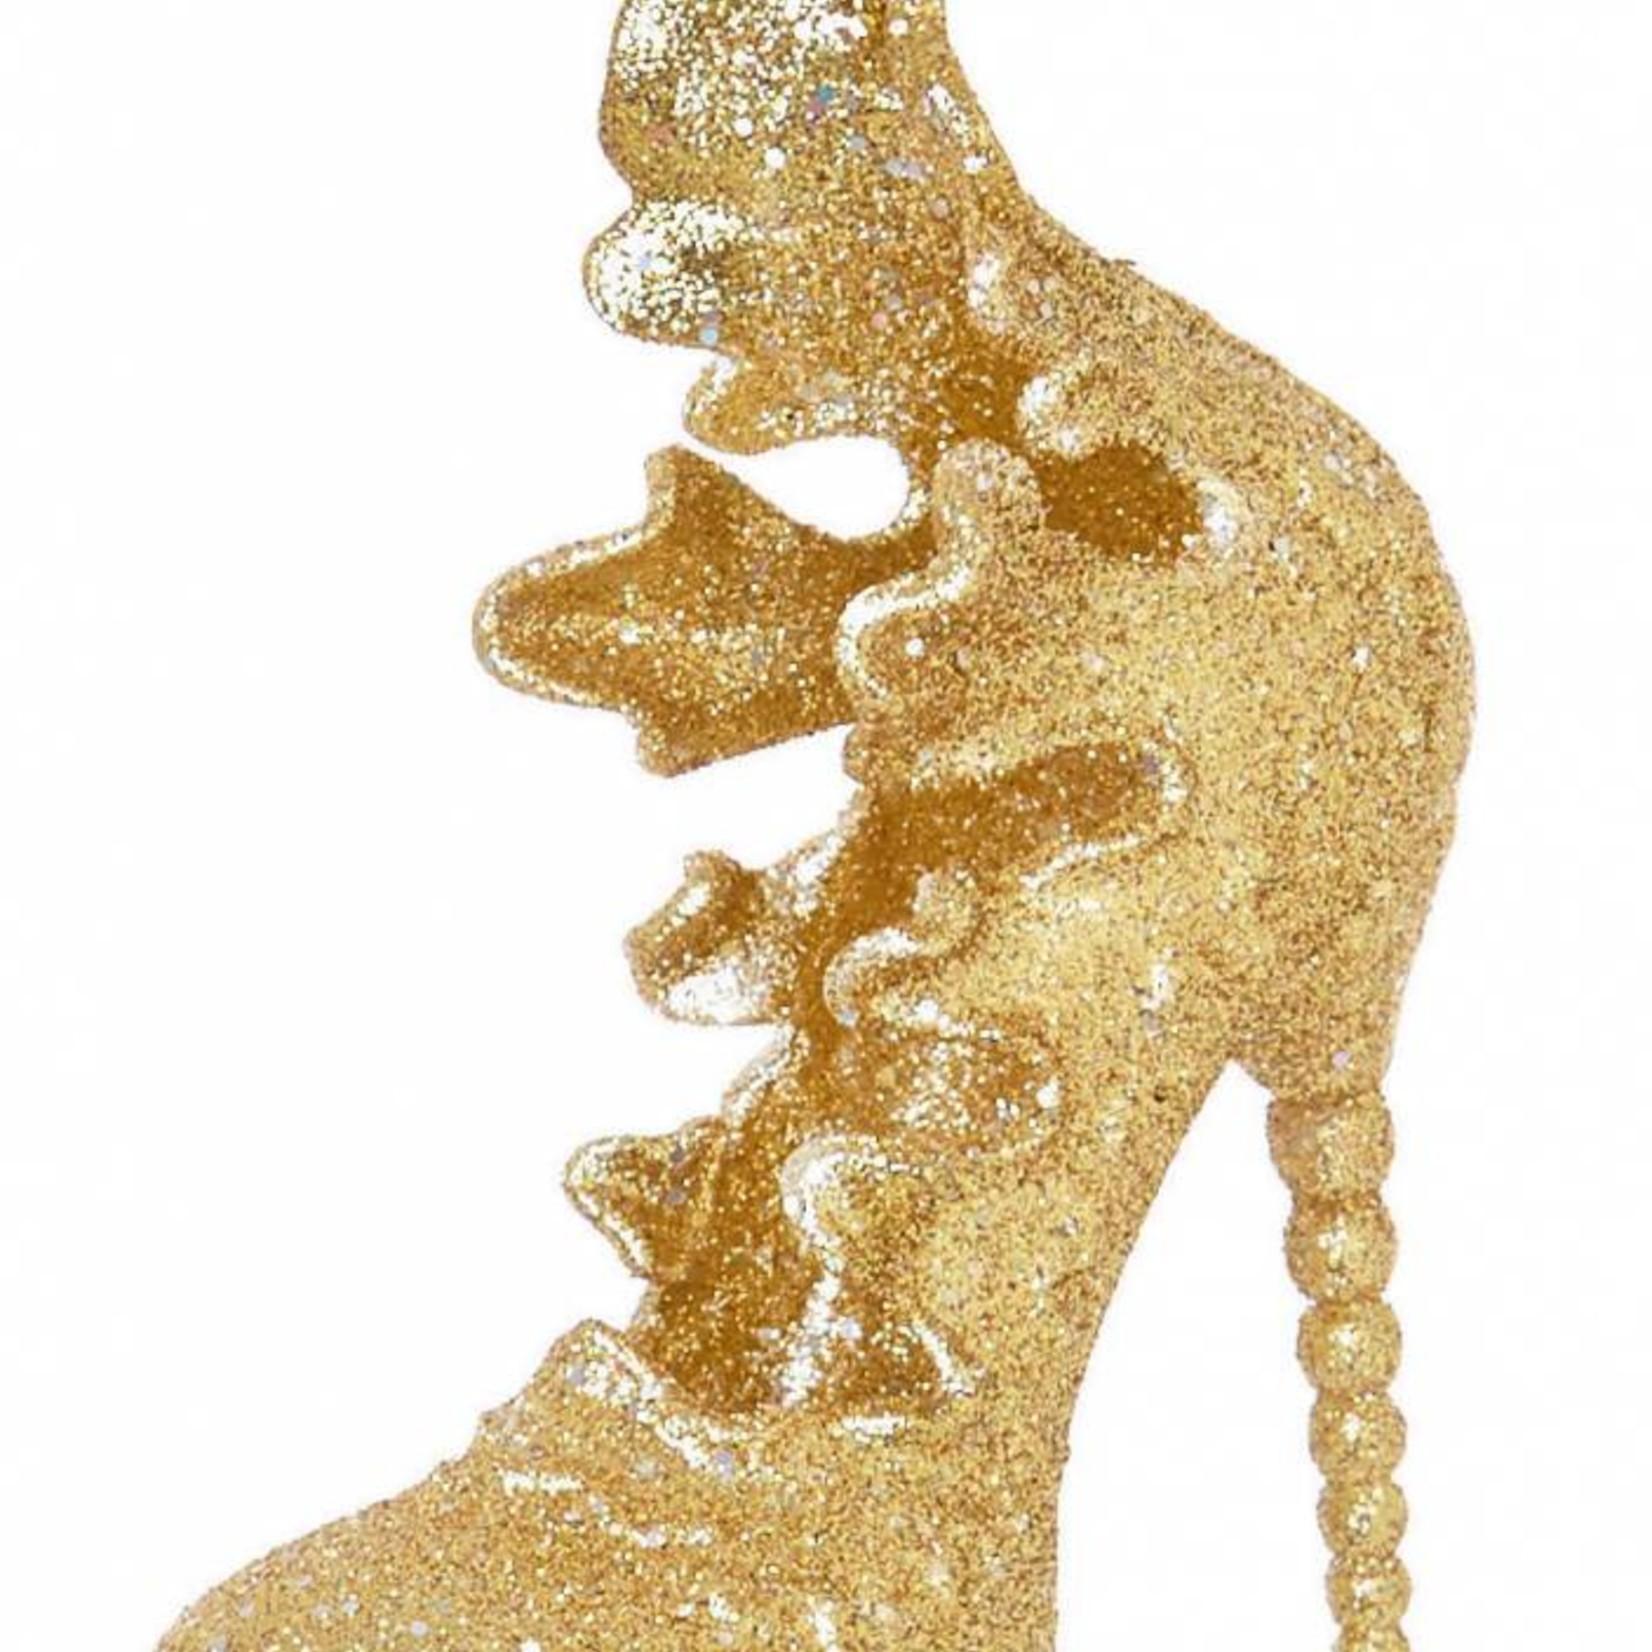 11cm Frilly Gold Glitter Shoe